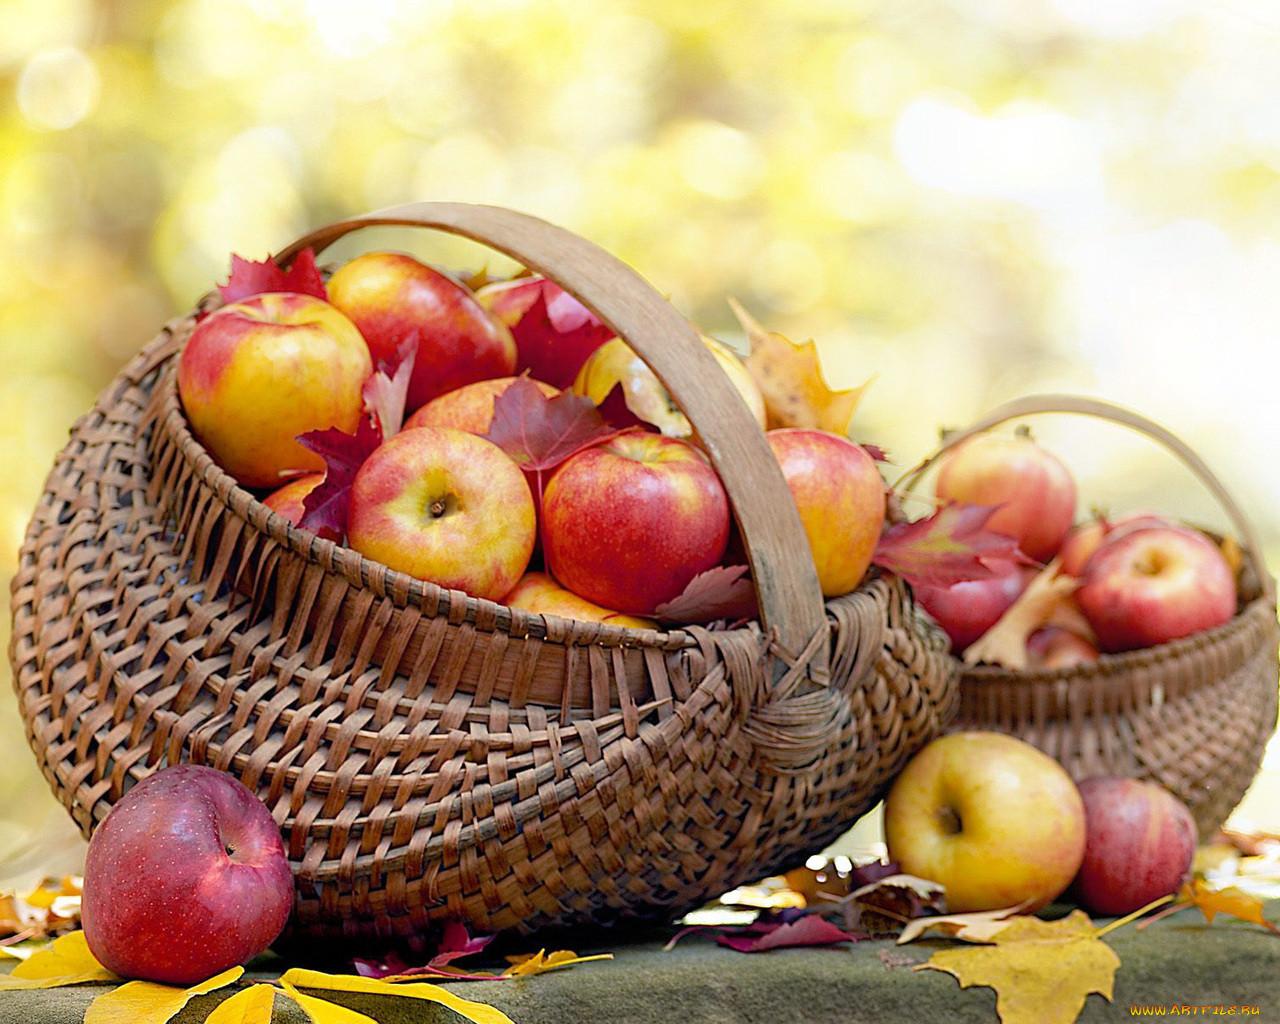 Картинка осенняя корзина с яблоками